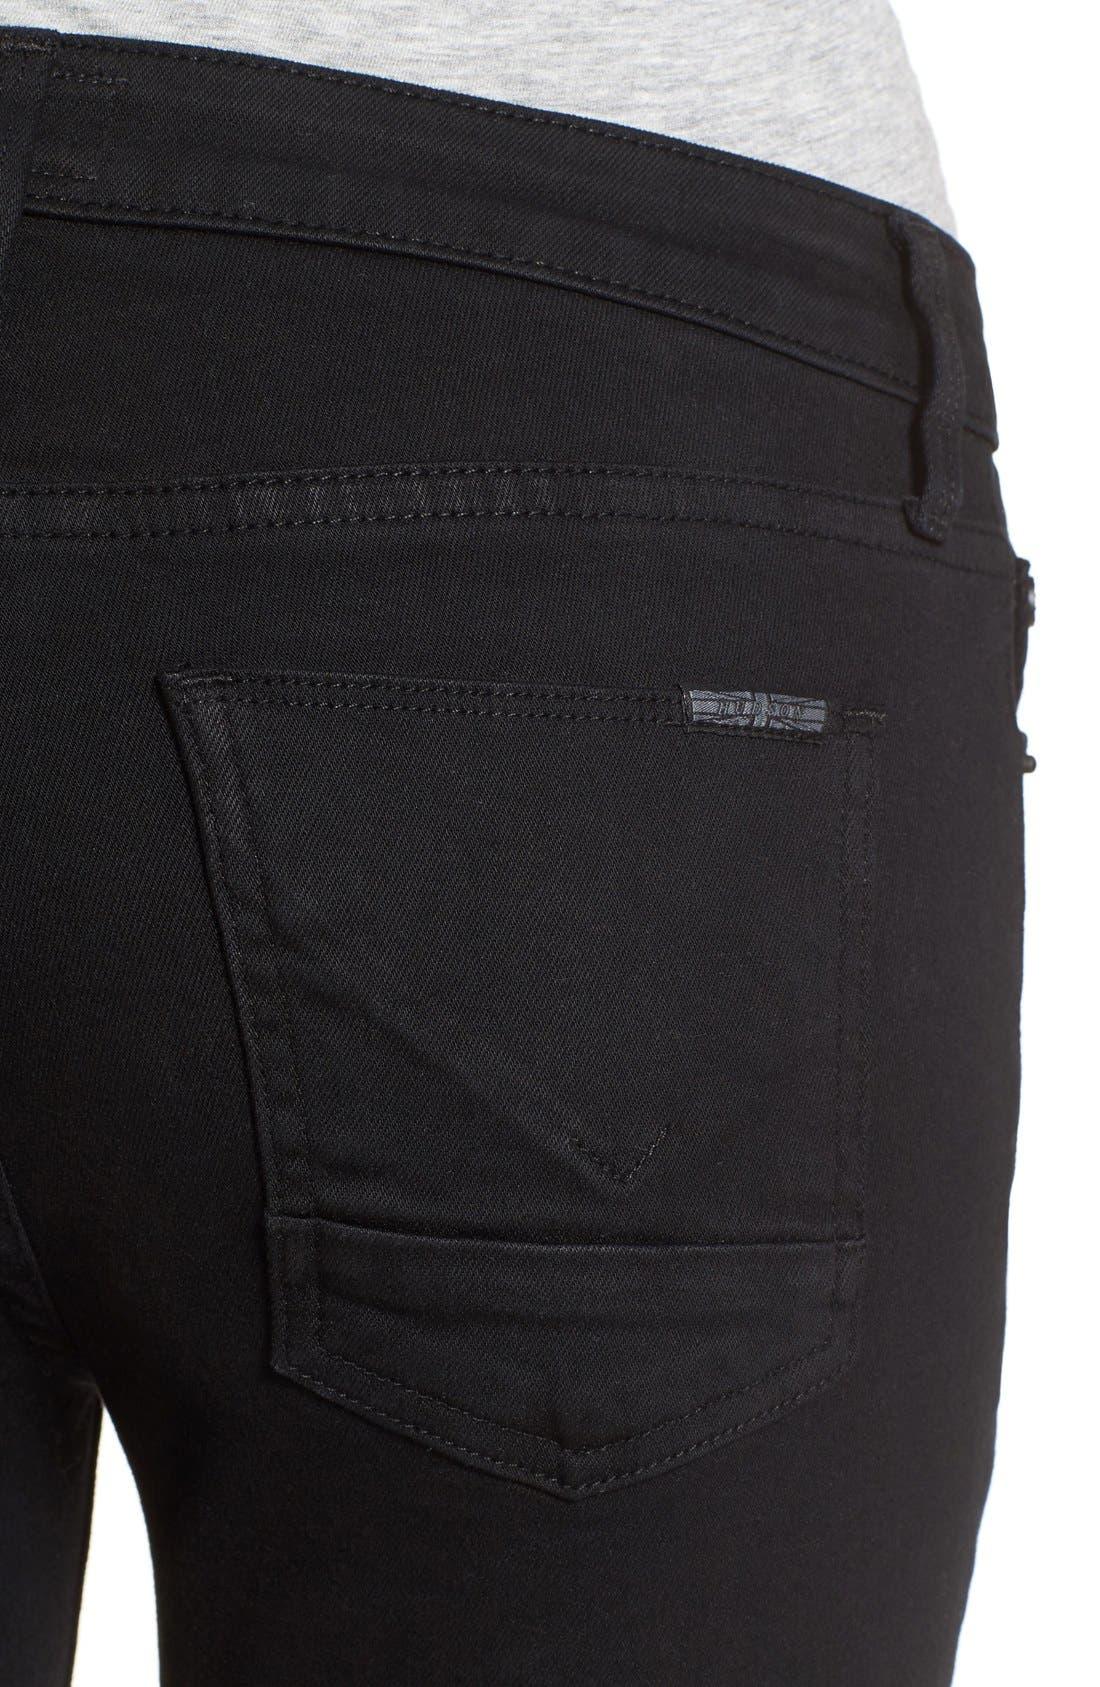 'Mia' Raw Hem Crop Flare Jeans,                             Alternate thumbnail 2, color,                             001